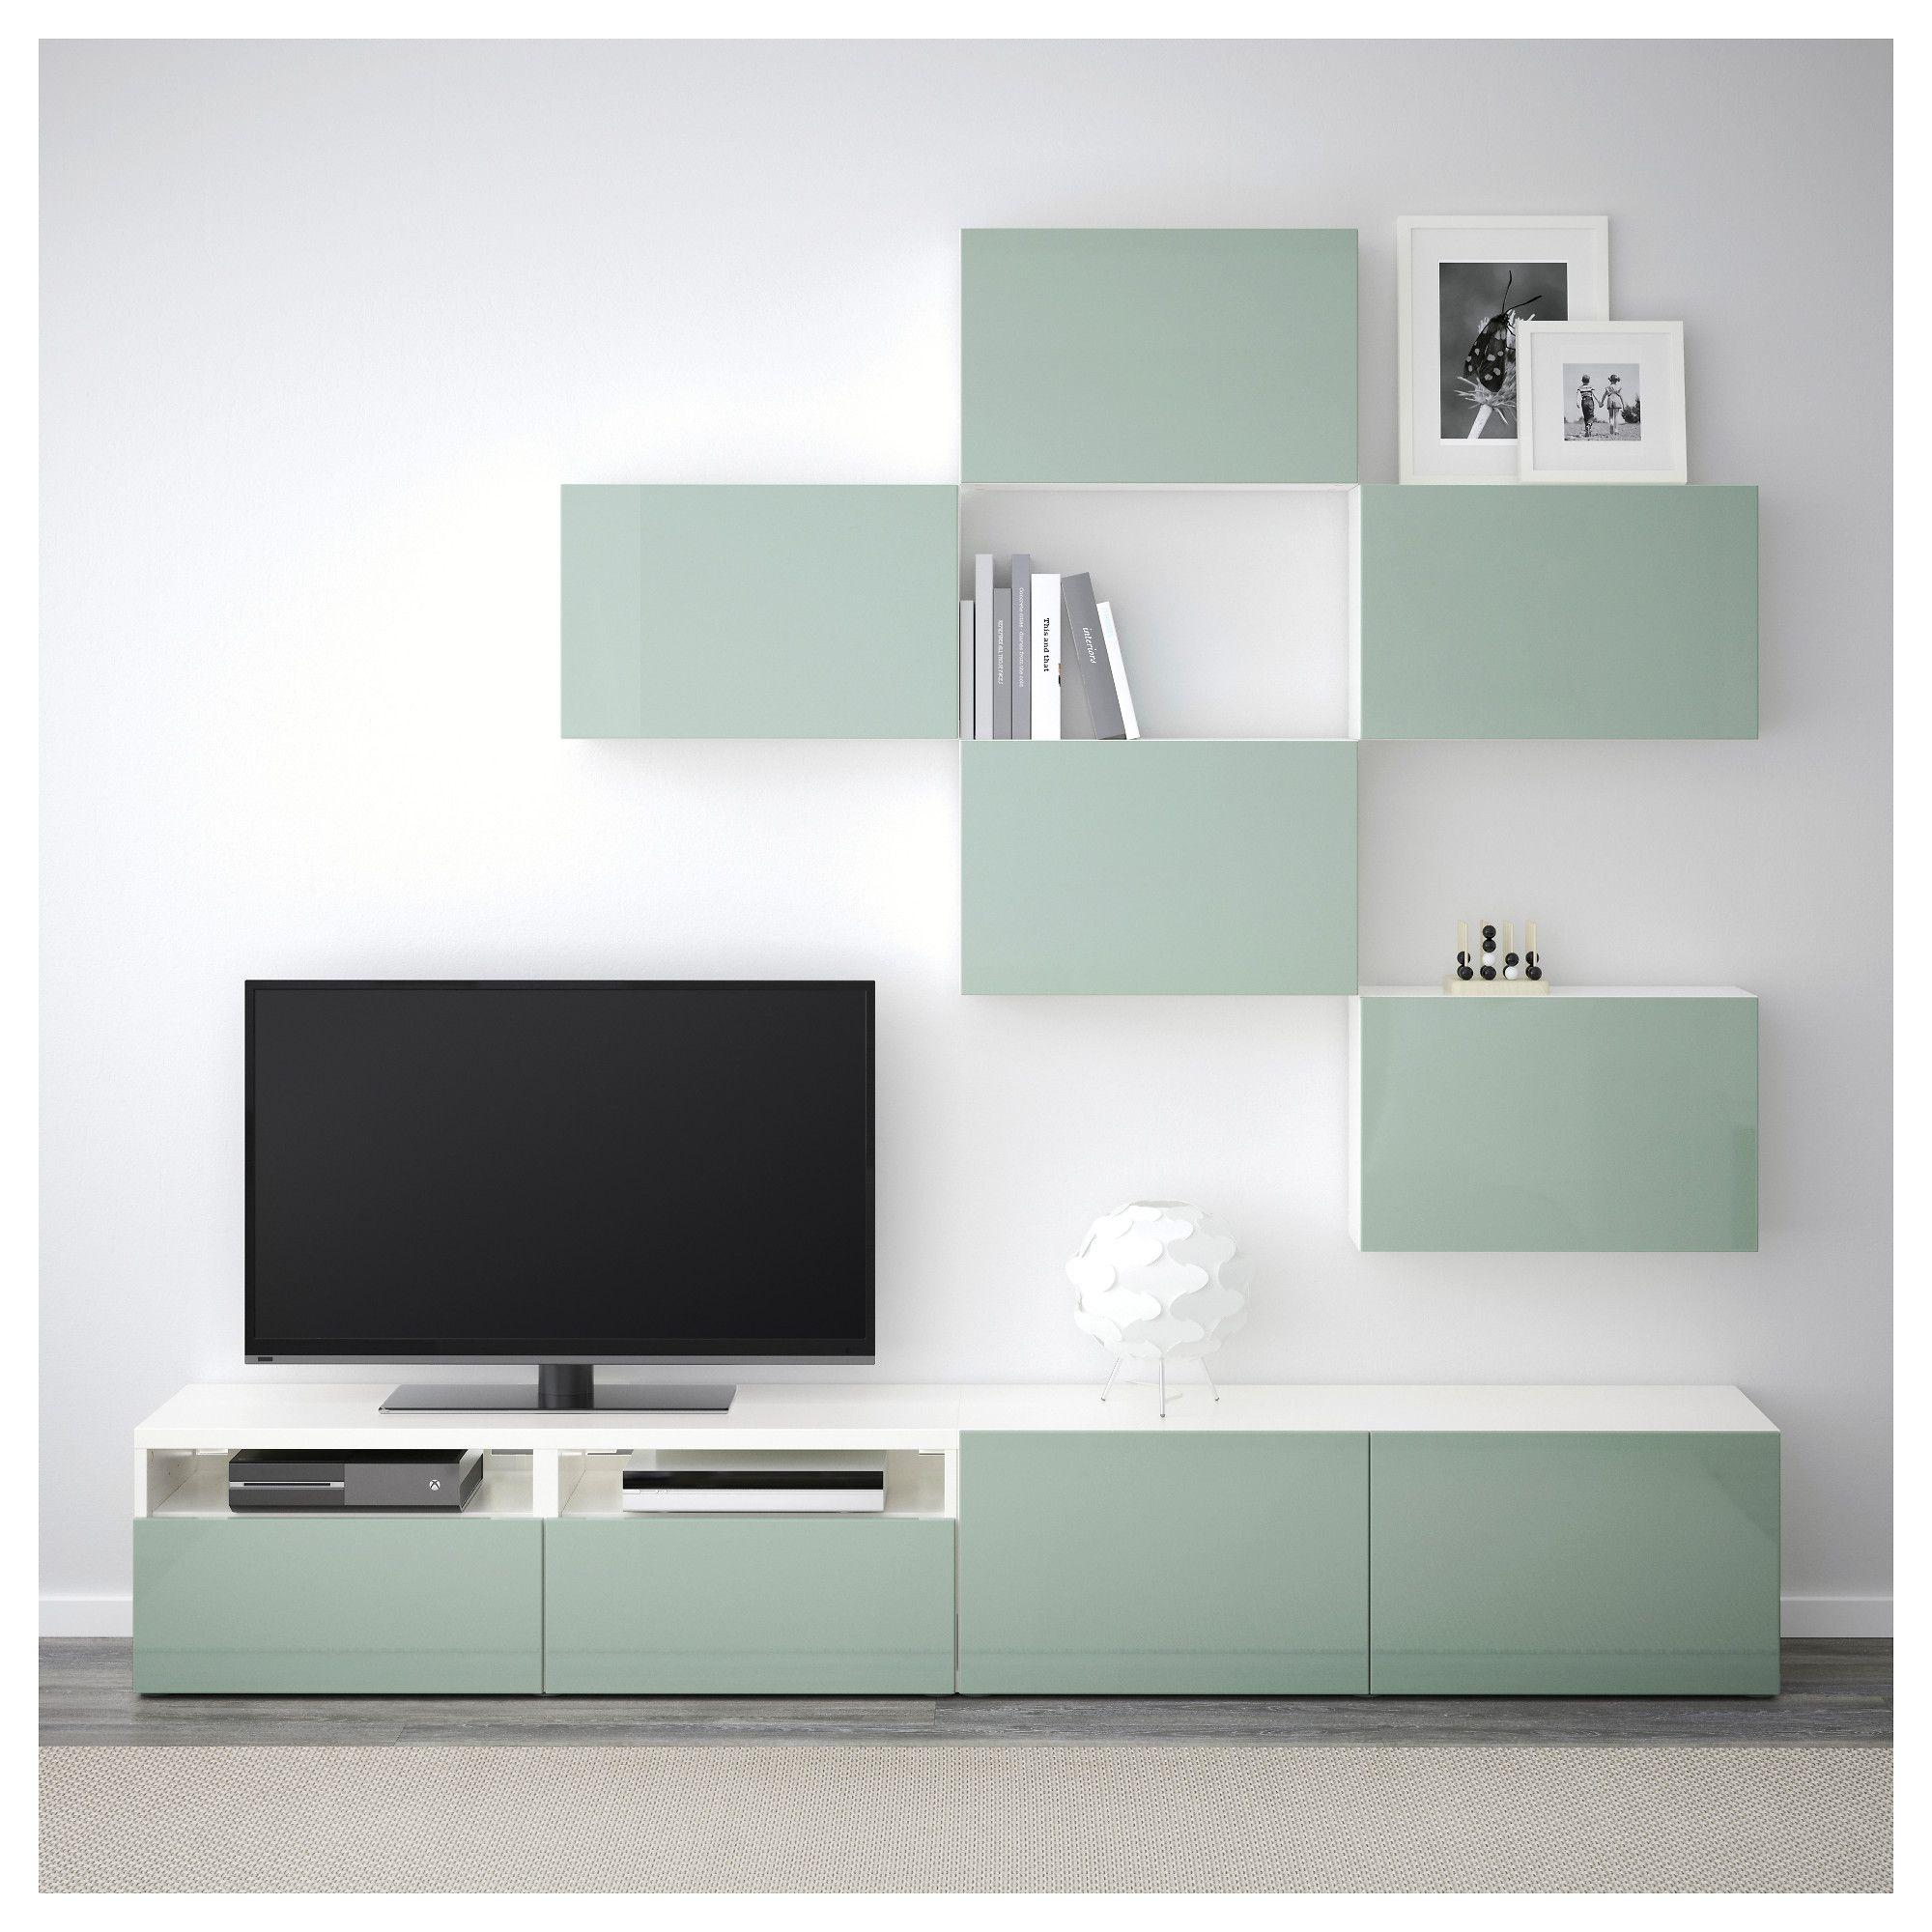 Furniture And Home Furnishings Tv Storage Interior Design